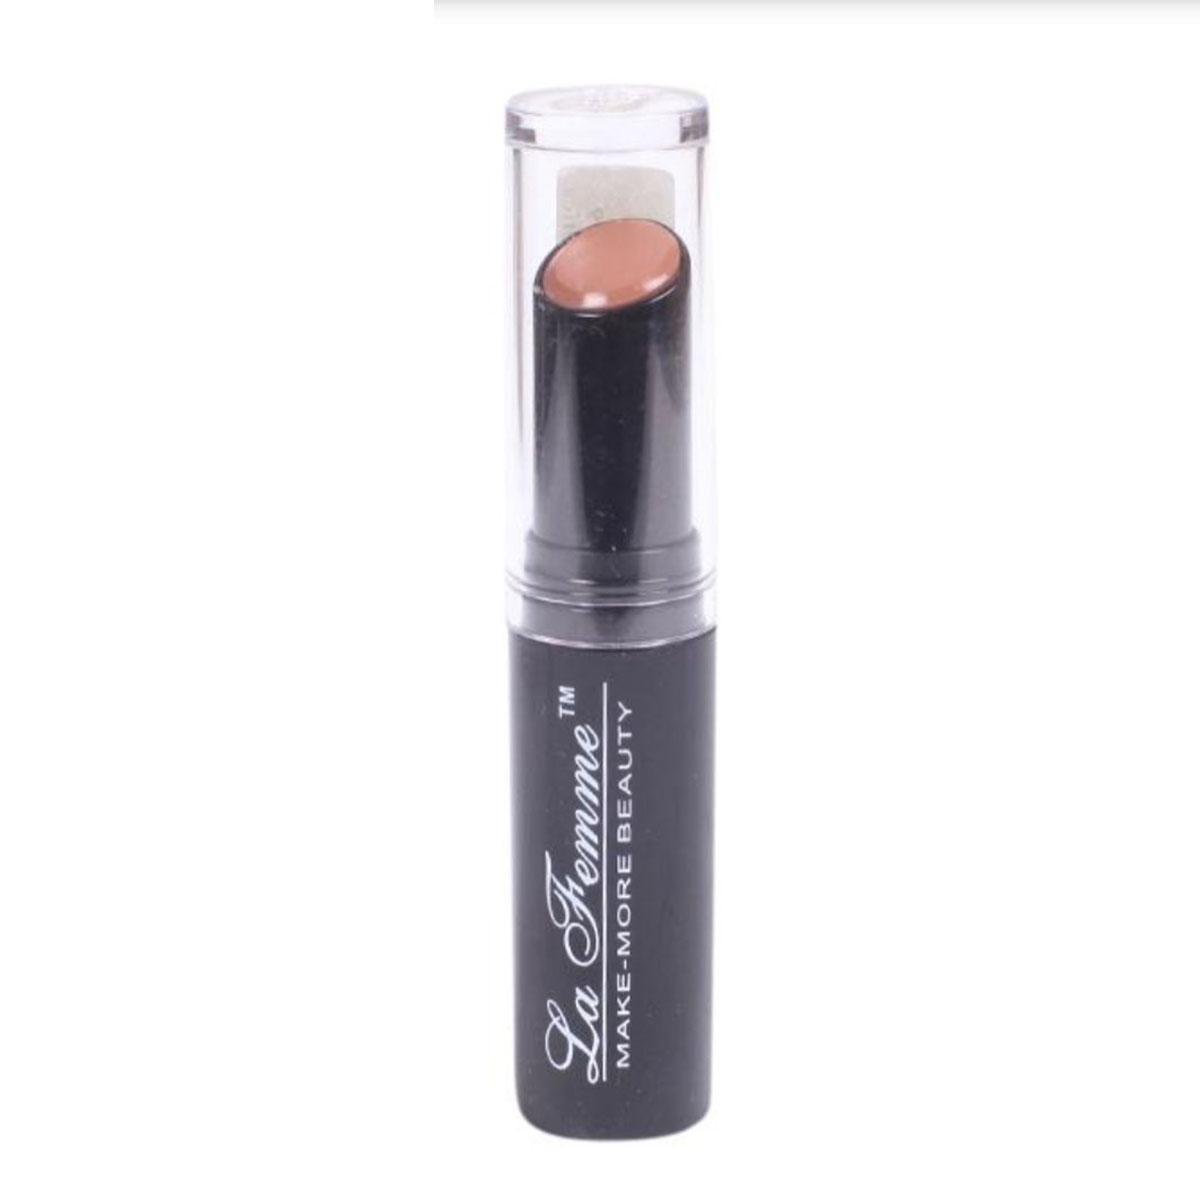 Super Matte Lipstick - Shade 315